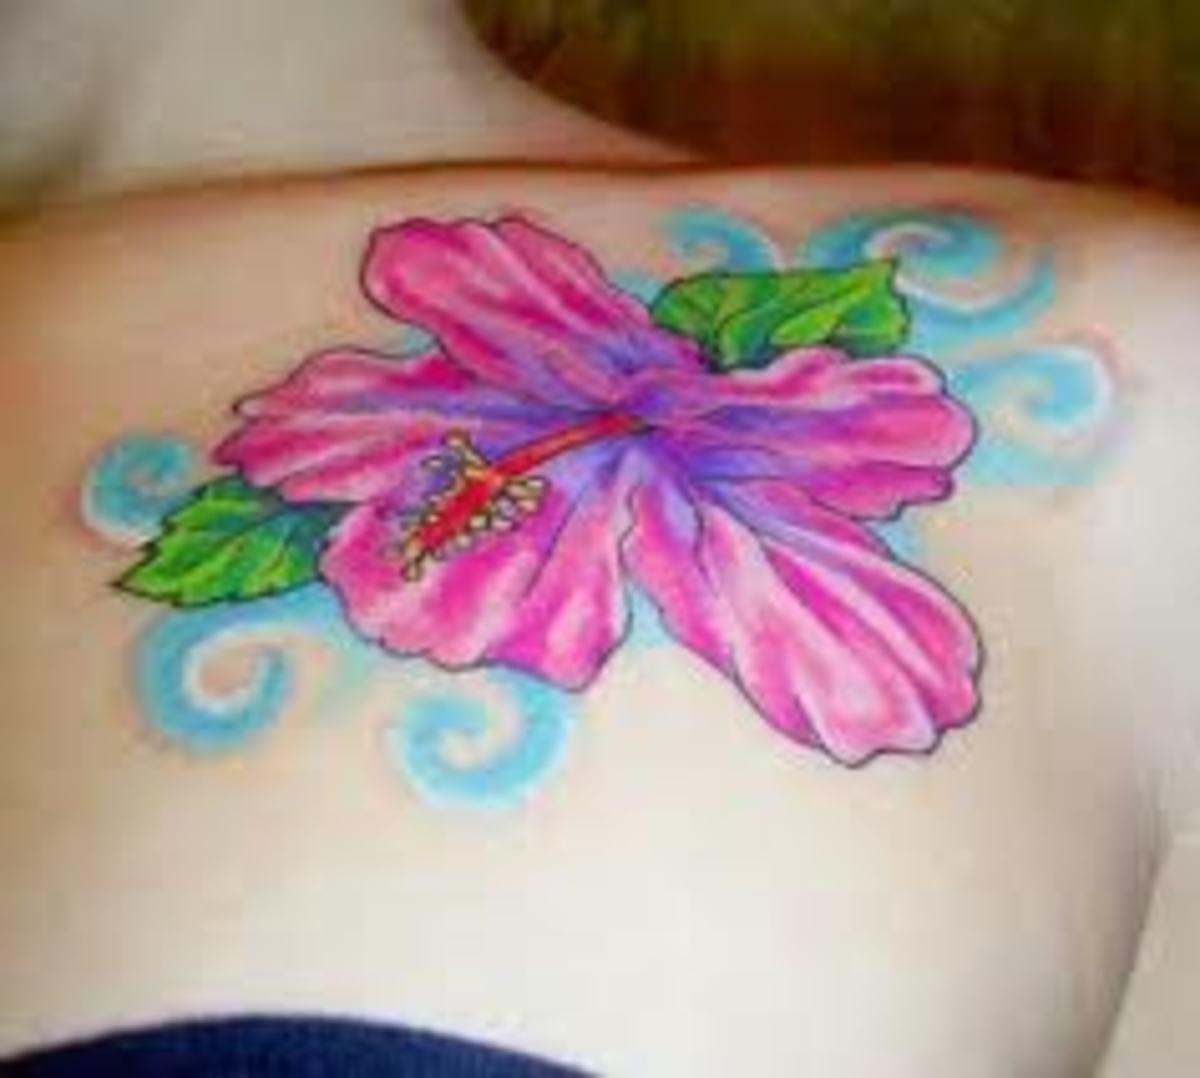 27 Hawaiian Tattoo Ideas Designs: Hawaiian Tattoo Designs, Meanings, And History